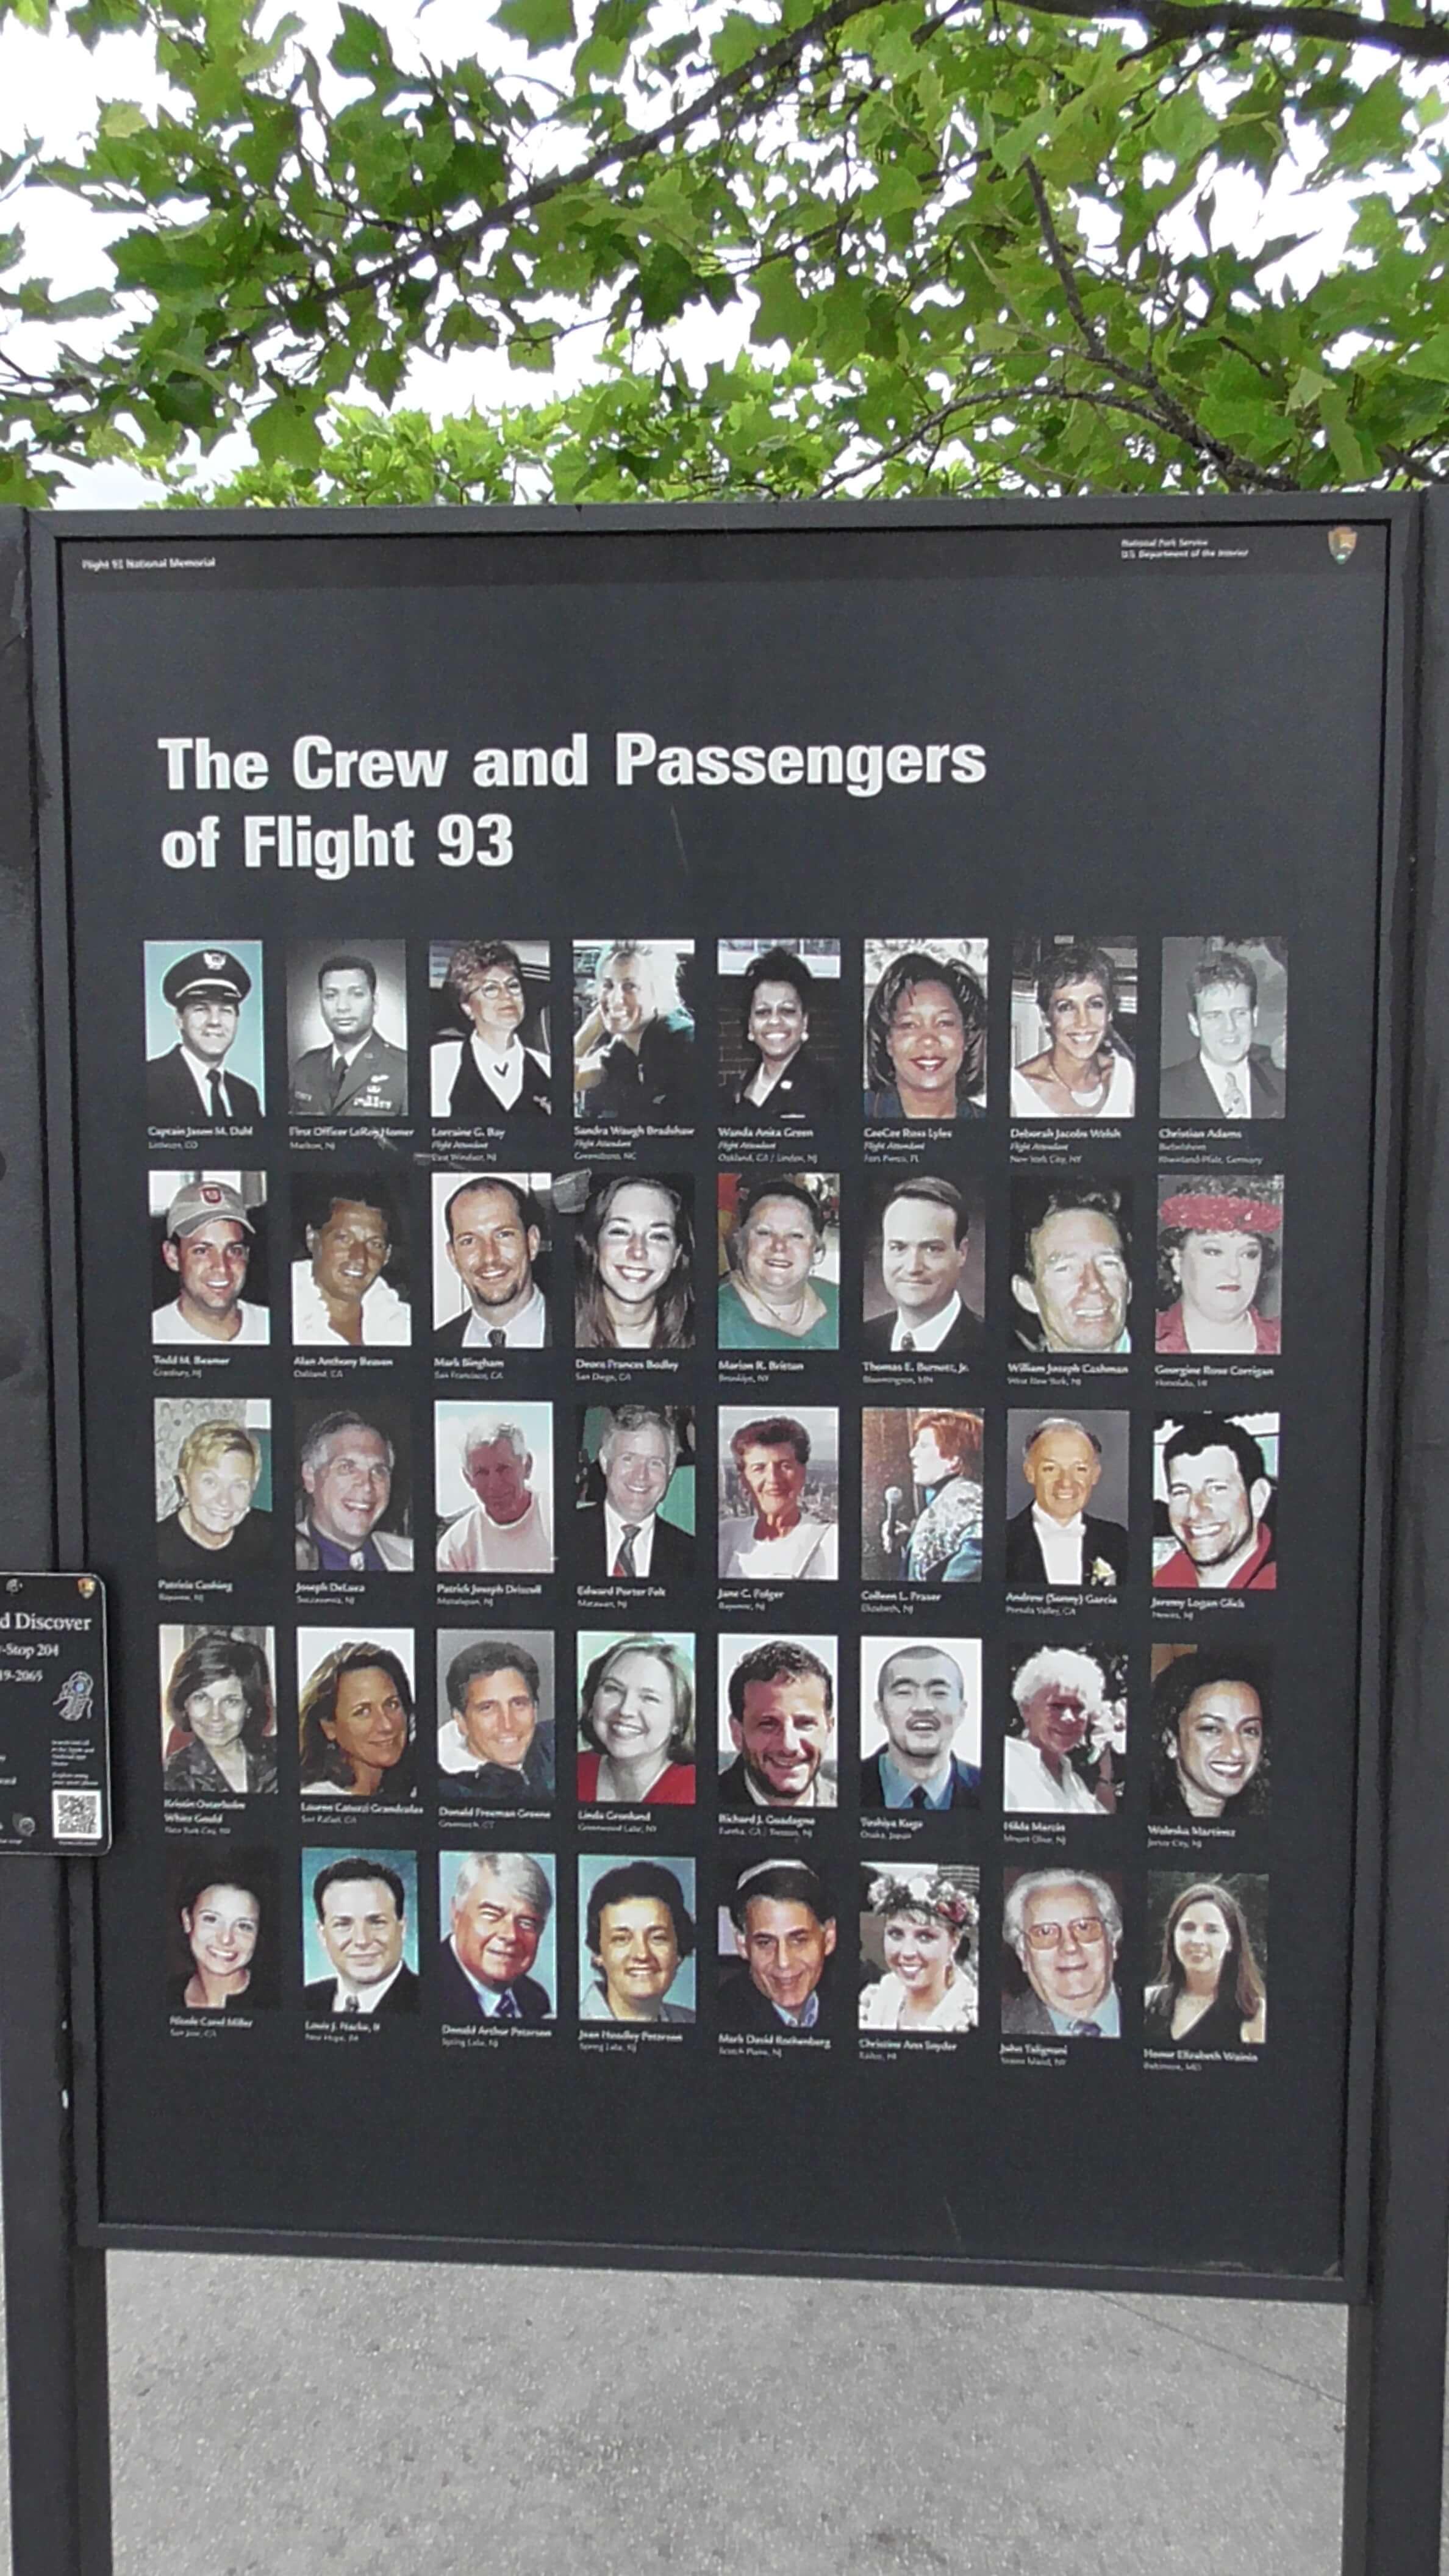 Passengers and Crew of Flight 93